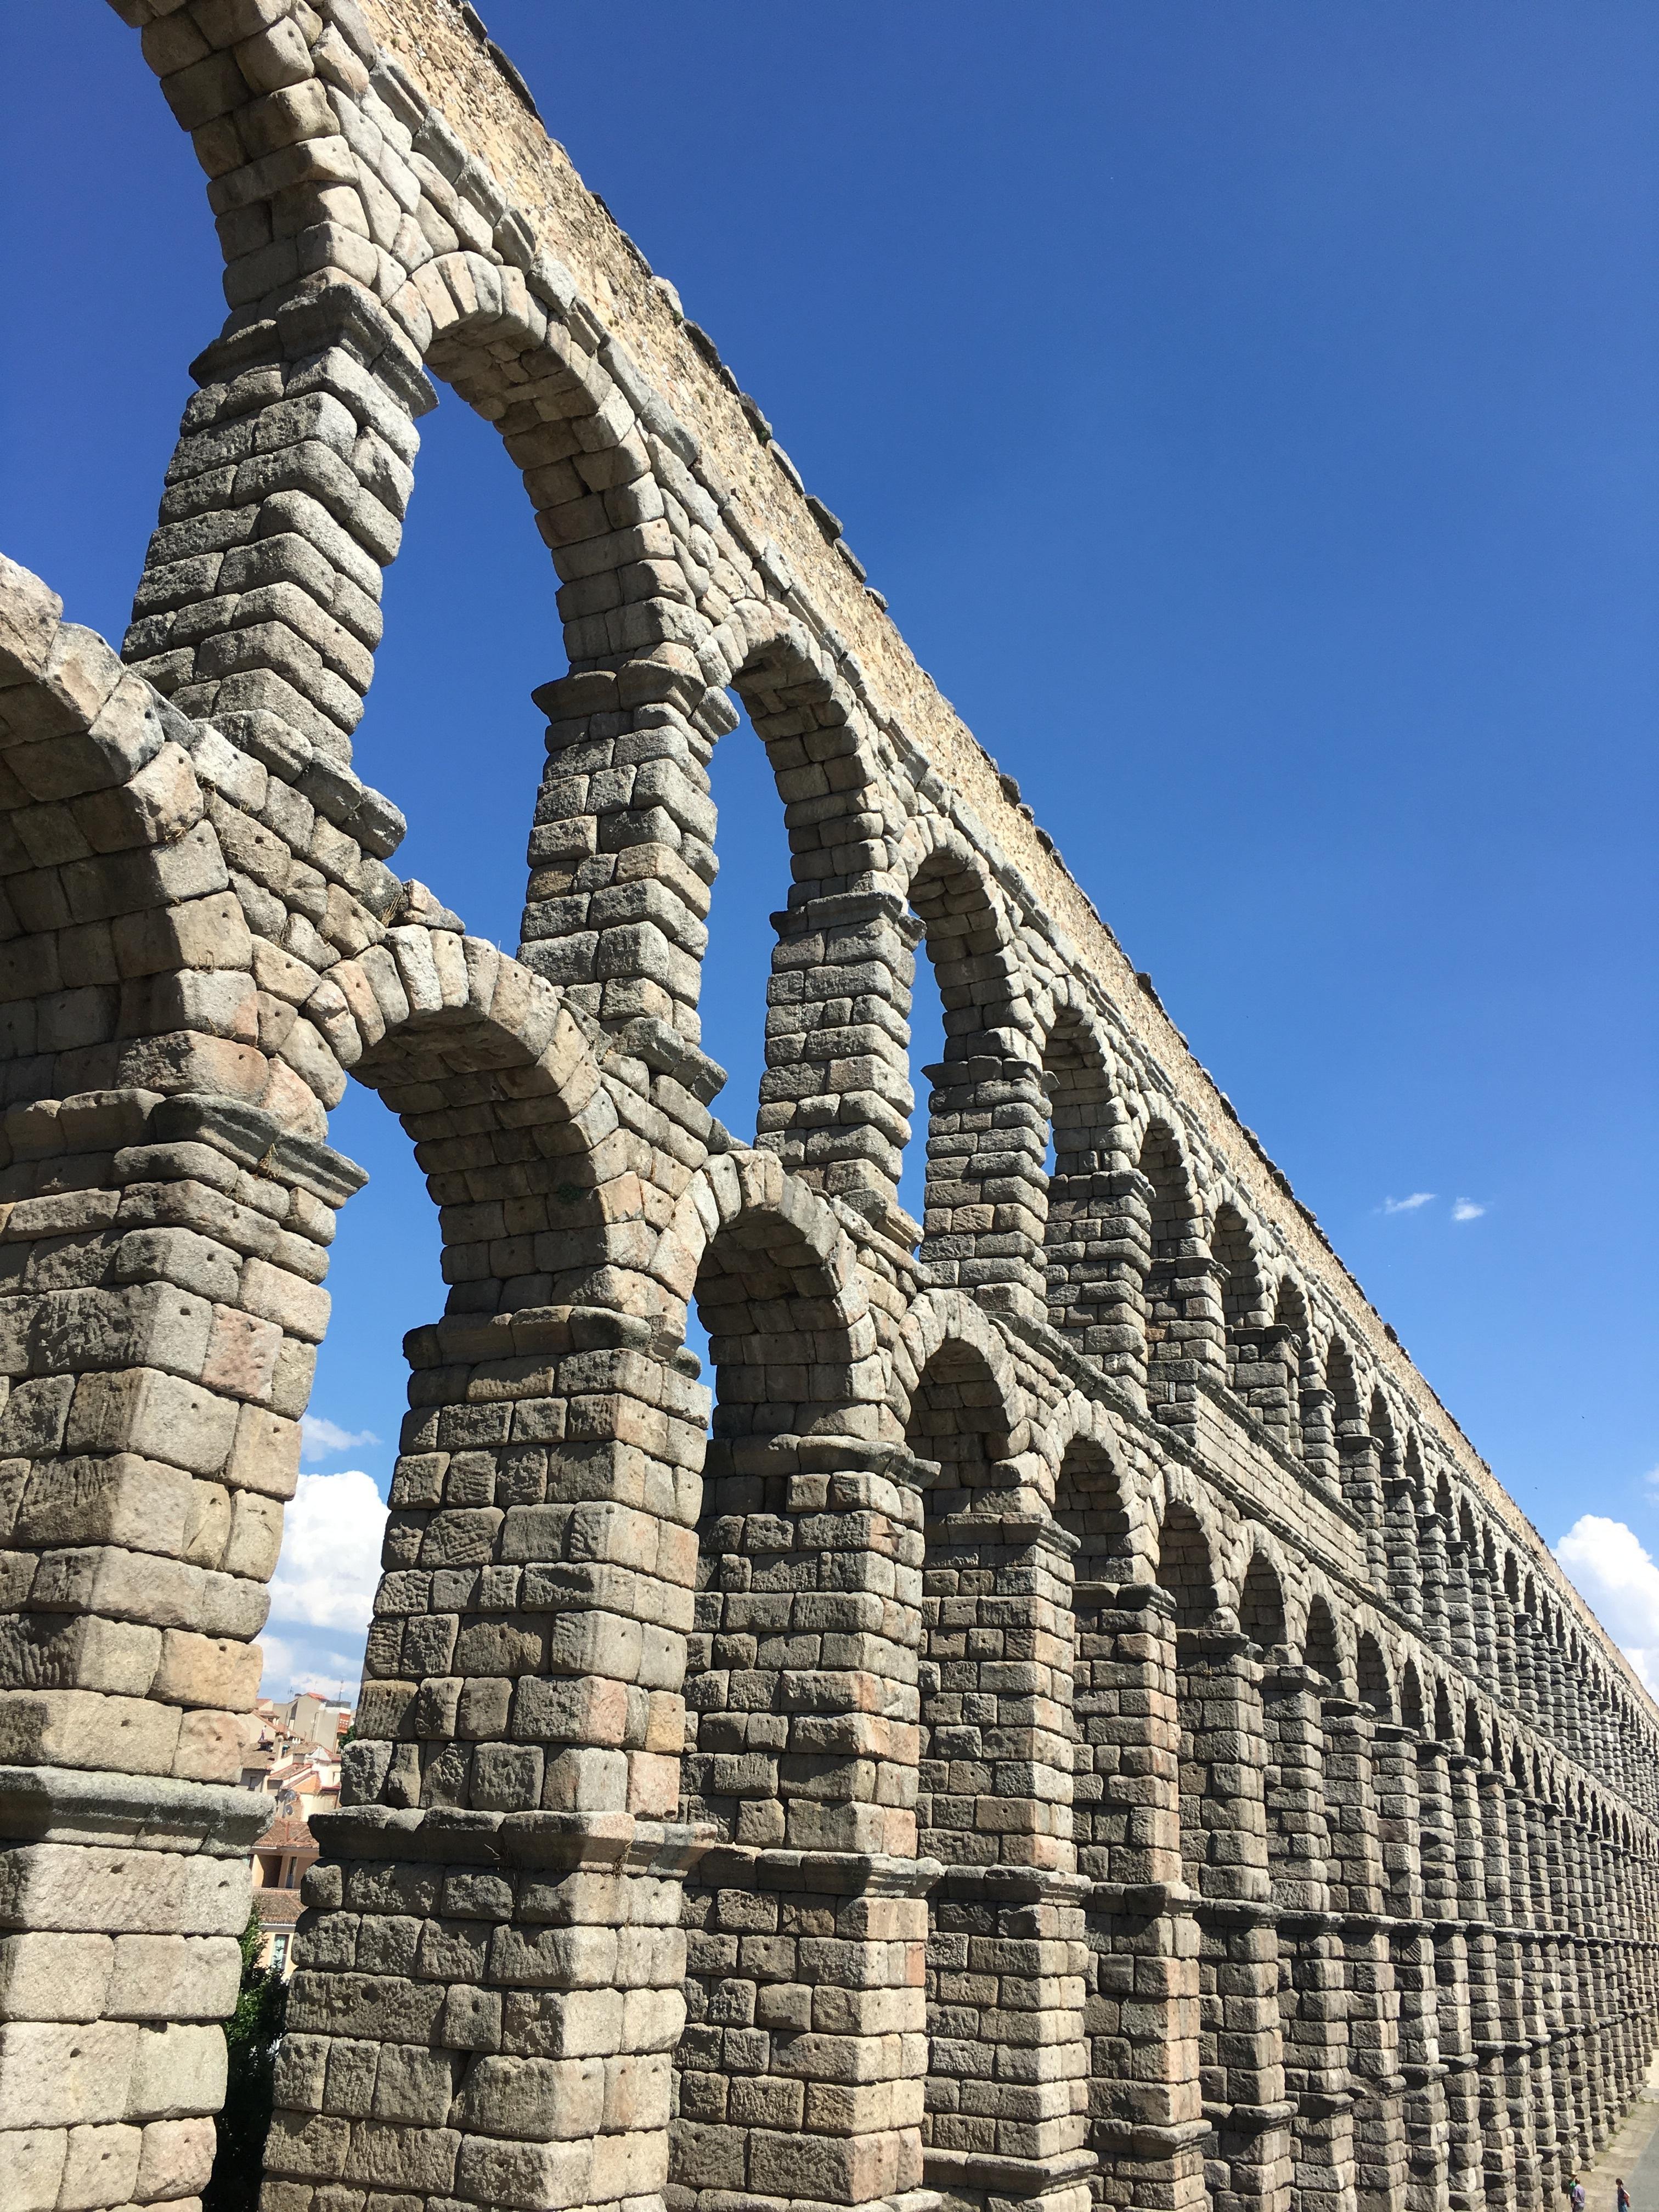 Fotos gratis arquitectura estructura puente edificio monumento arco columna punto de - Acueducto de segovia arquitectura ...